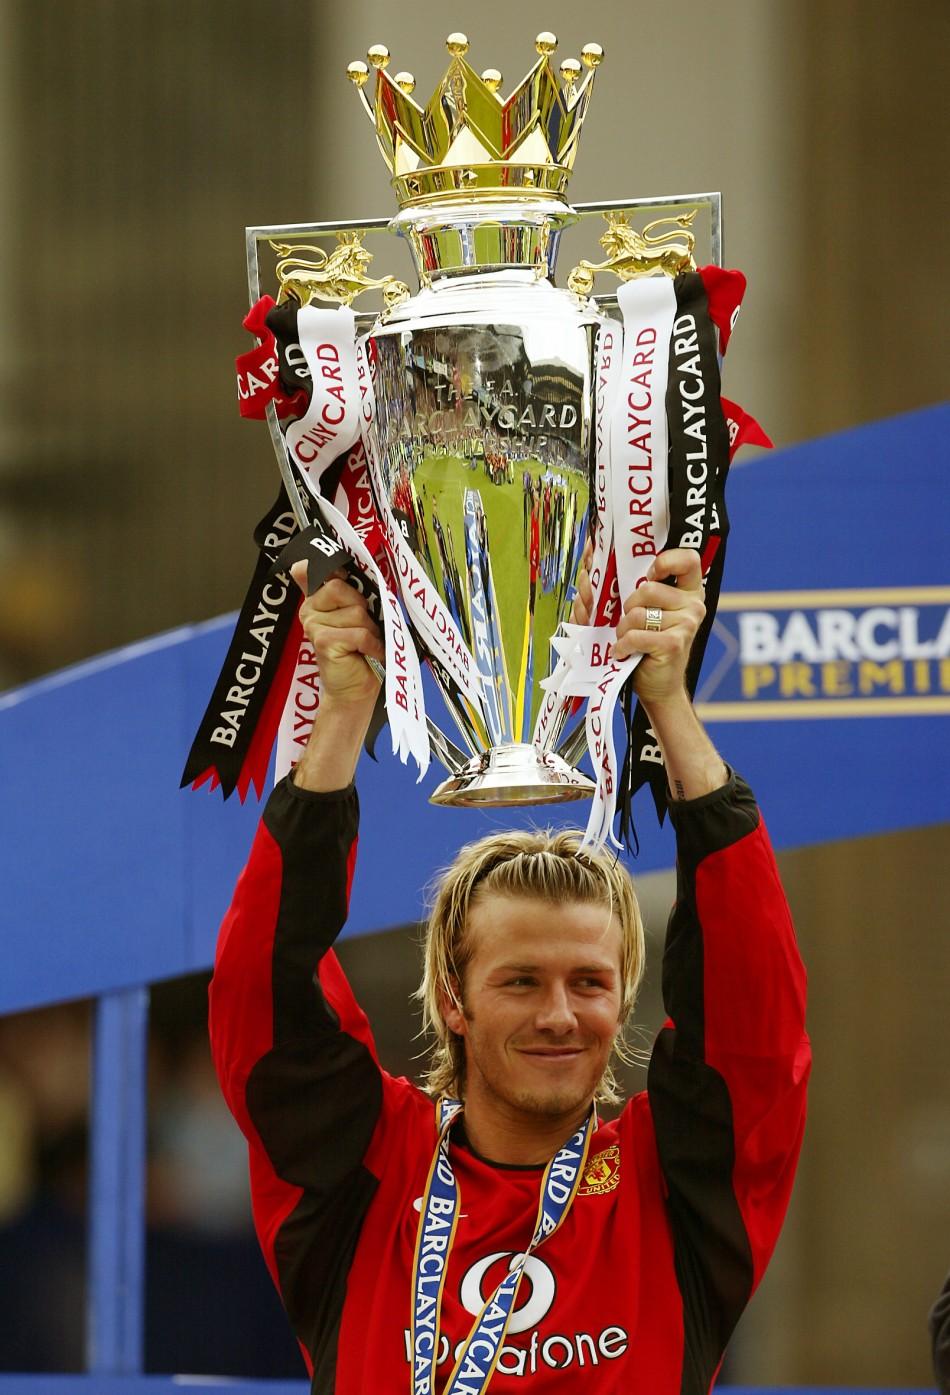 Sir Alex Ferguson Greatest Man United Celebrated Wins in 25 years - May 11, 2003